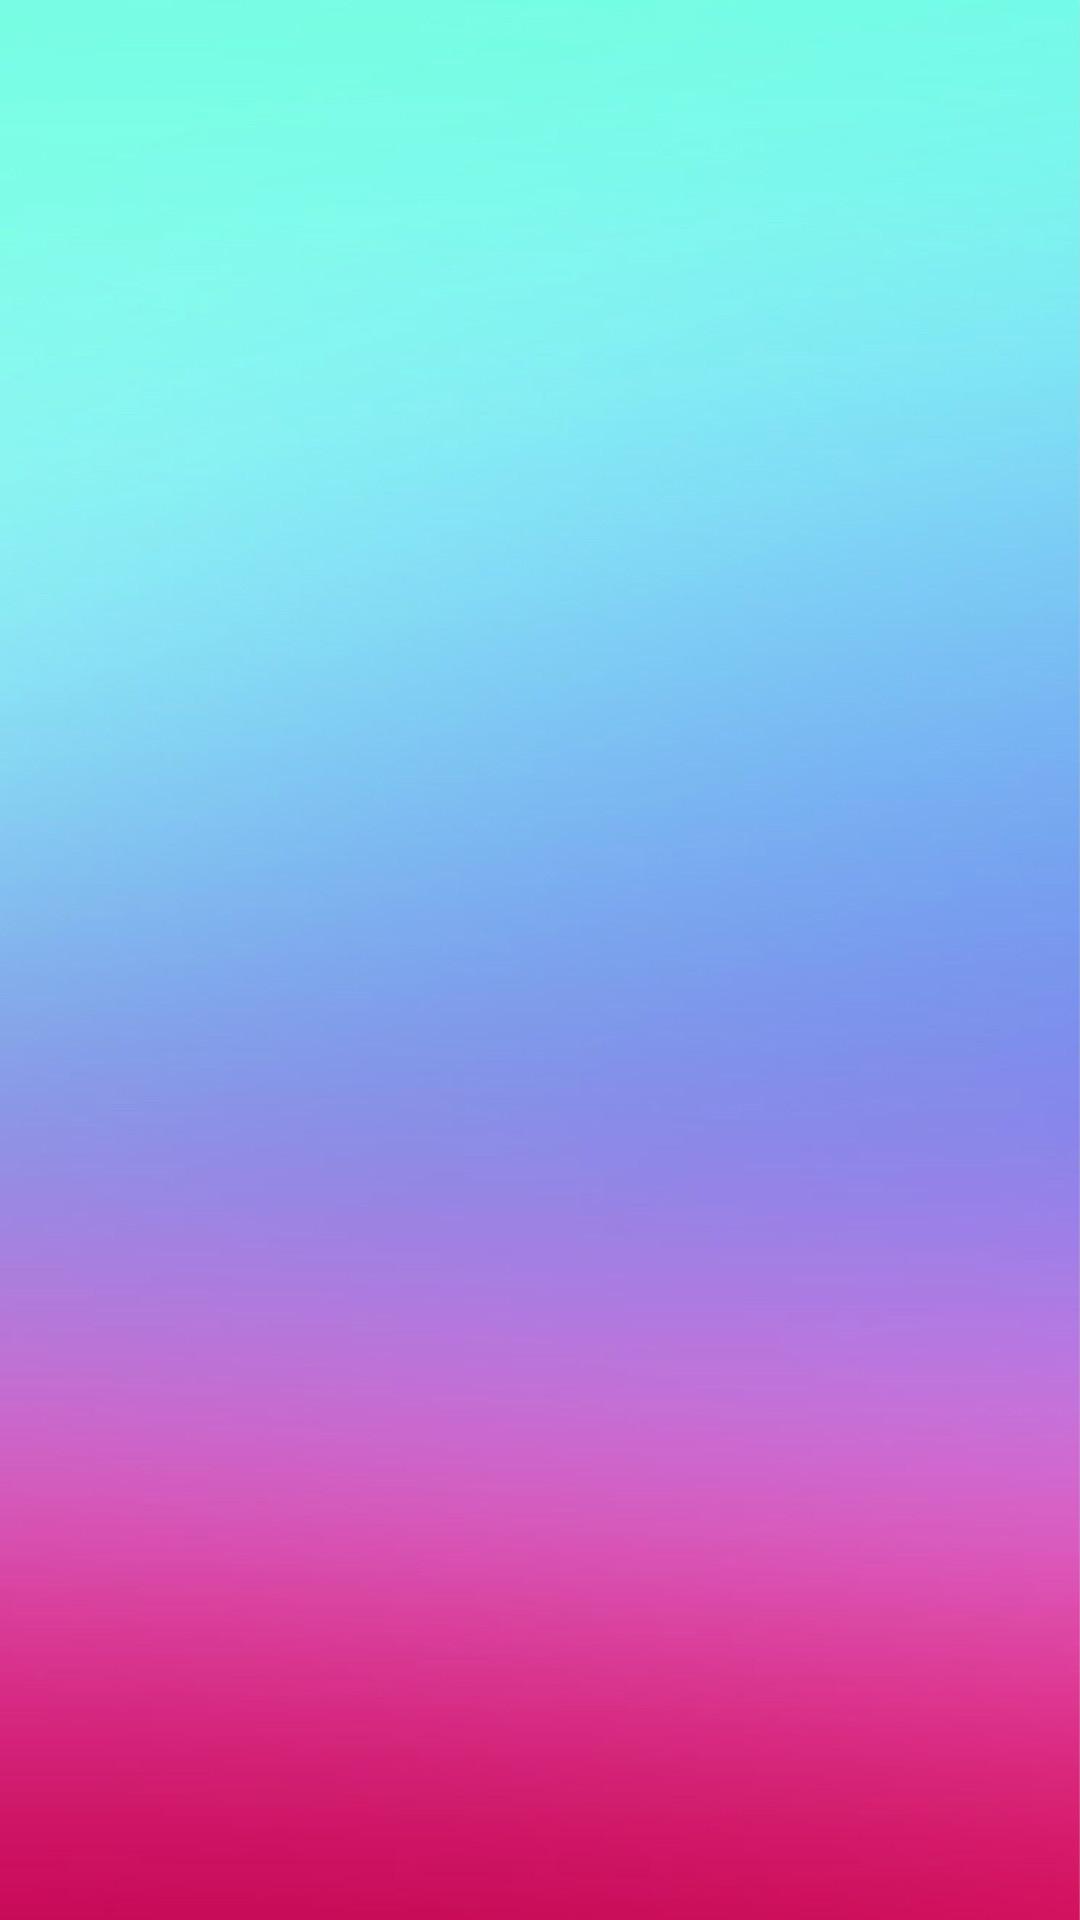 Color Gradation Blur Background iPhone 8 wallpaper